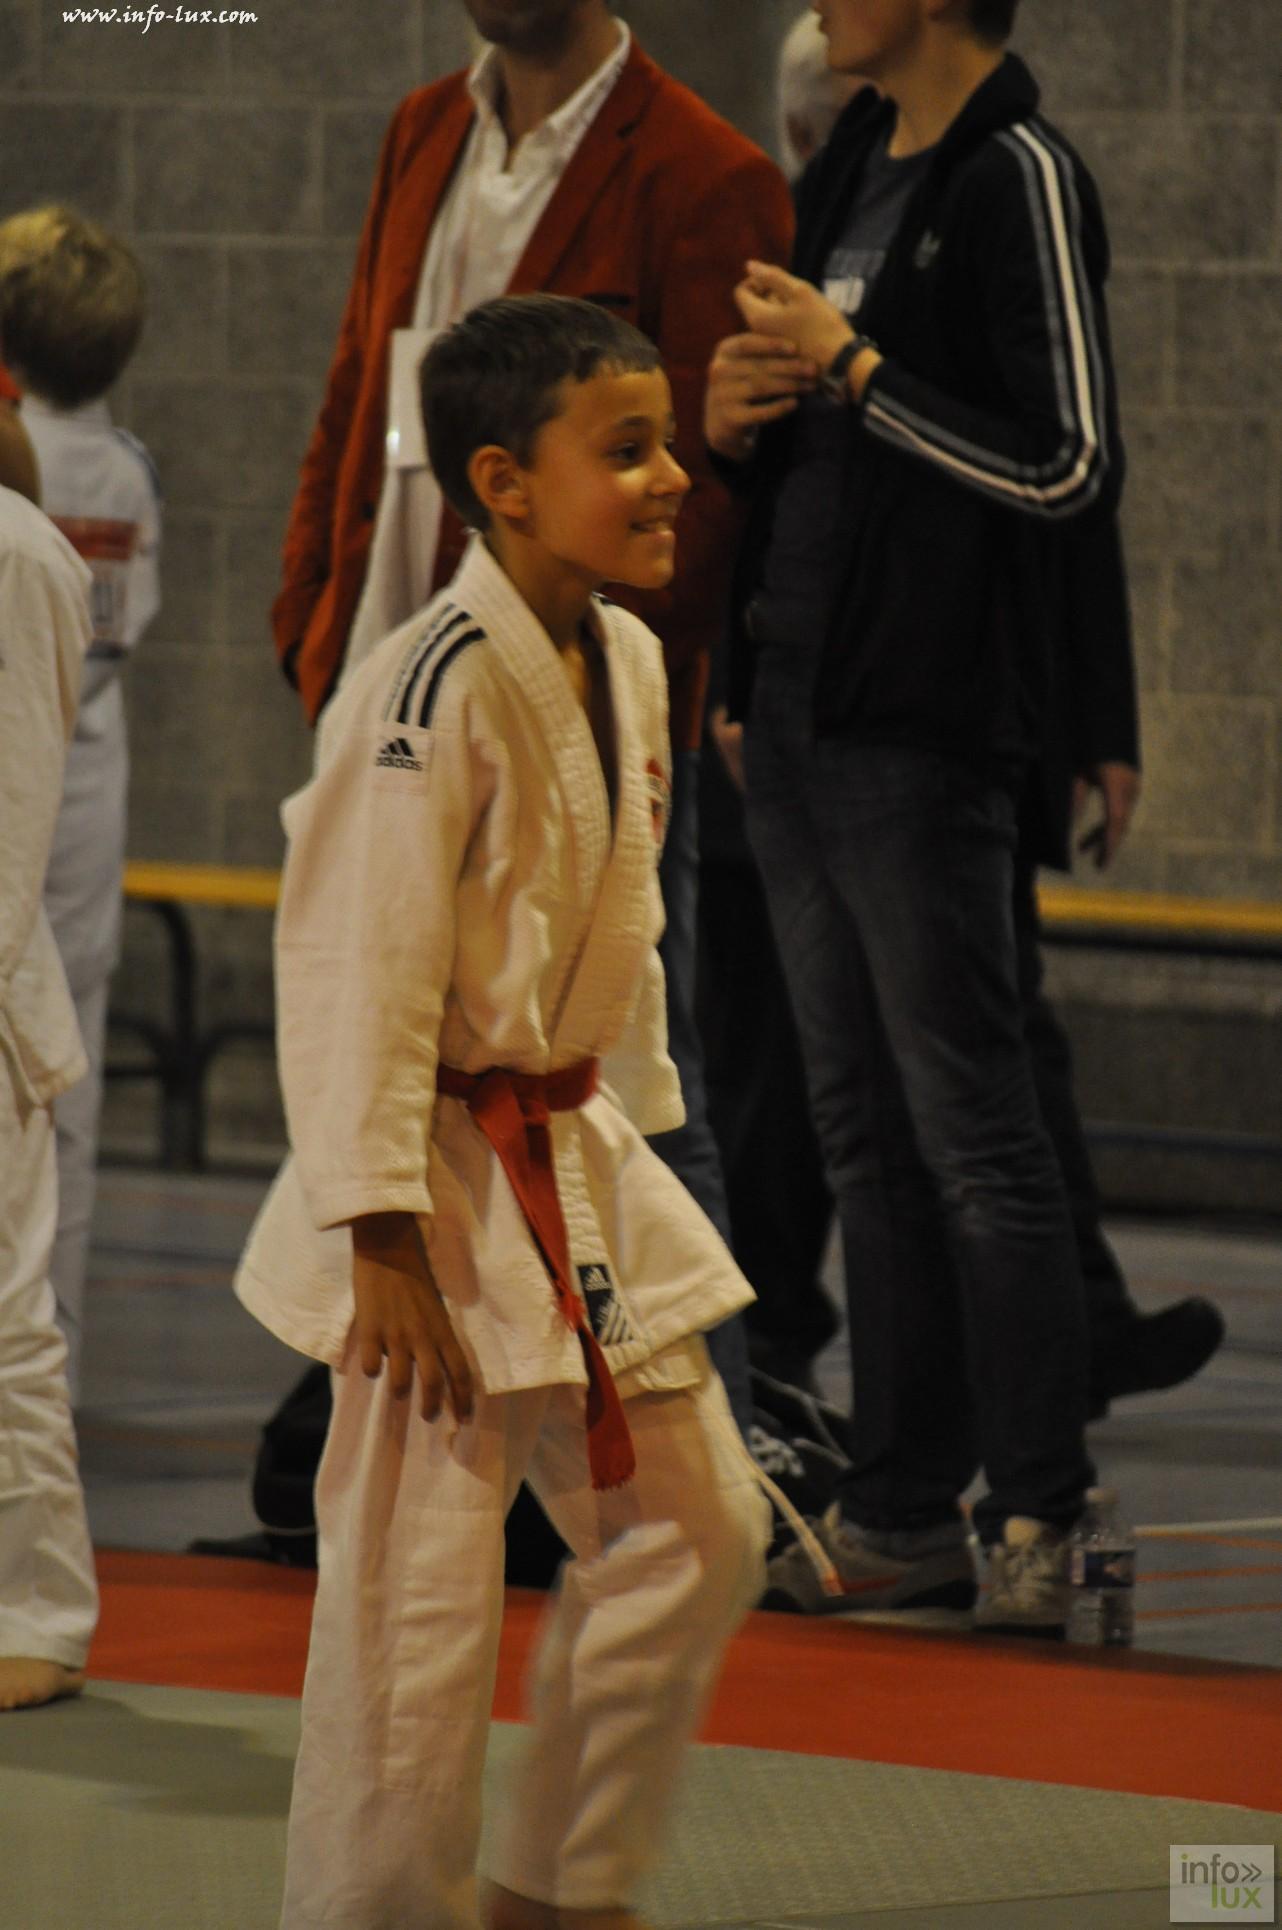 images/stories/PHOTOSREP/Bastogne/judo/Judo-Basto05